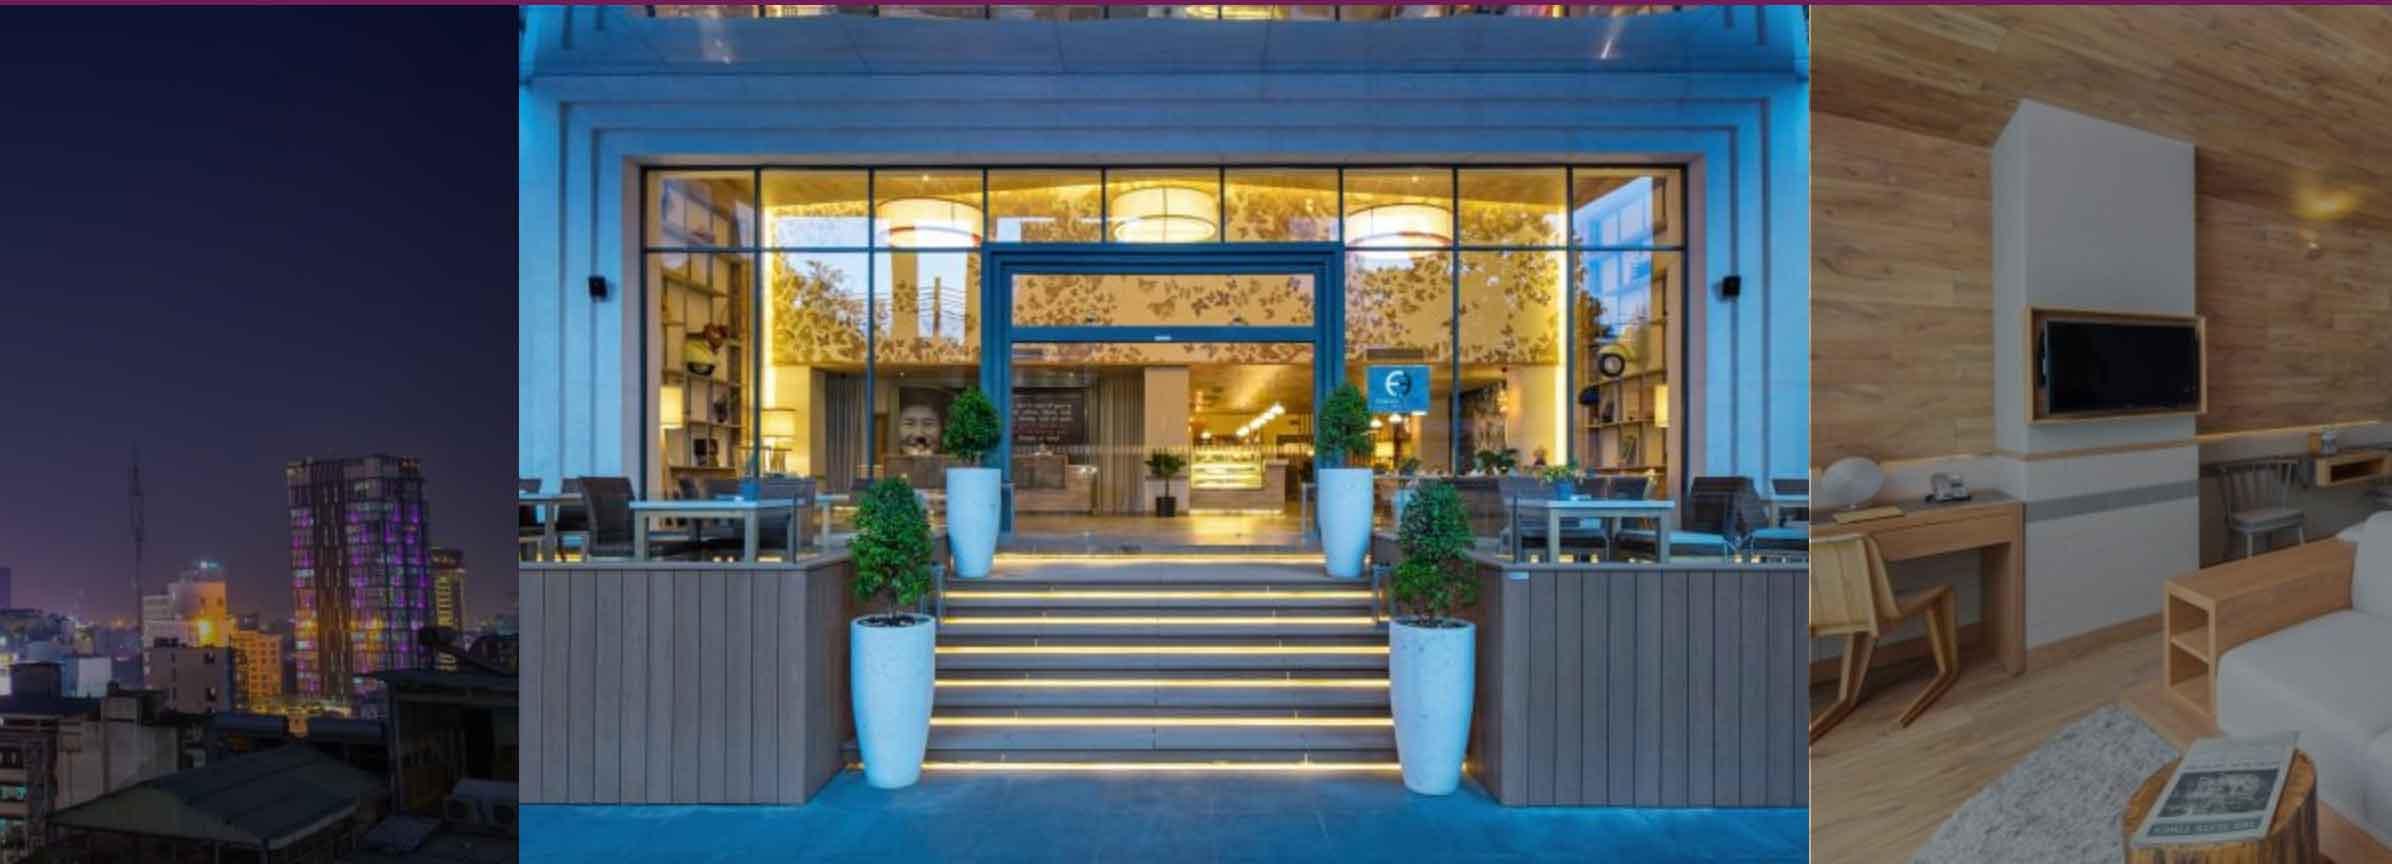 Fusion Suites Saigon Hotel